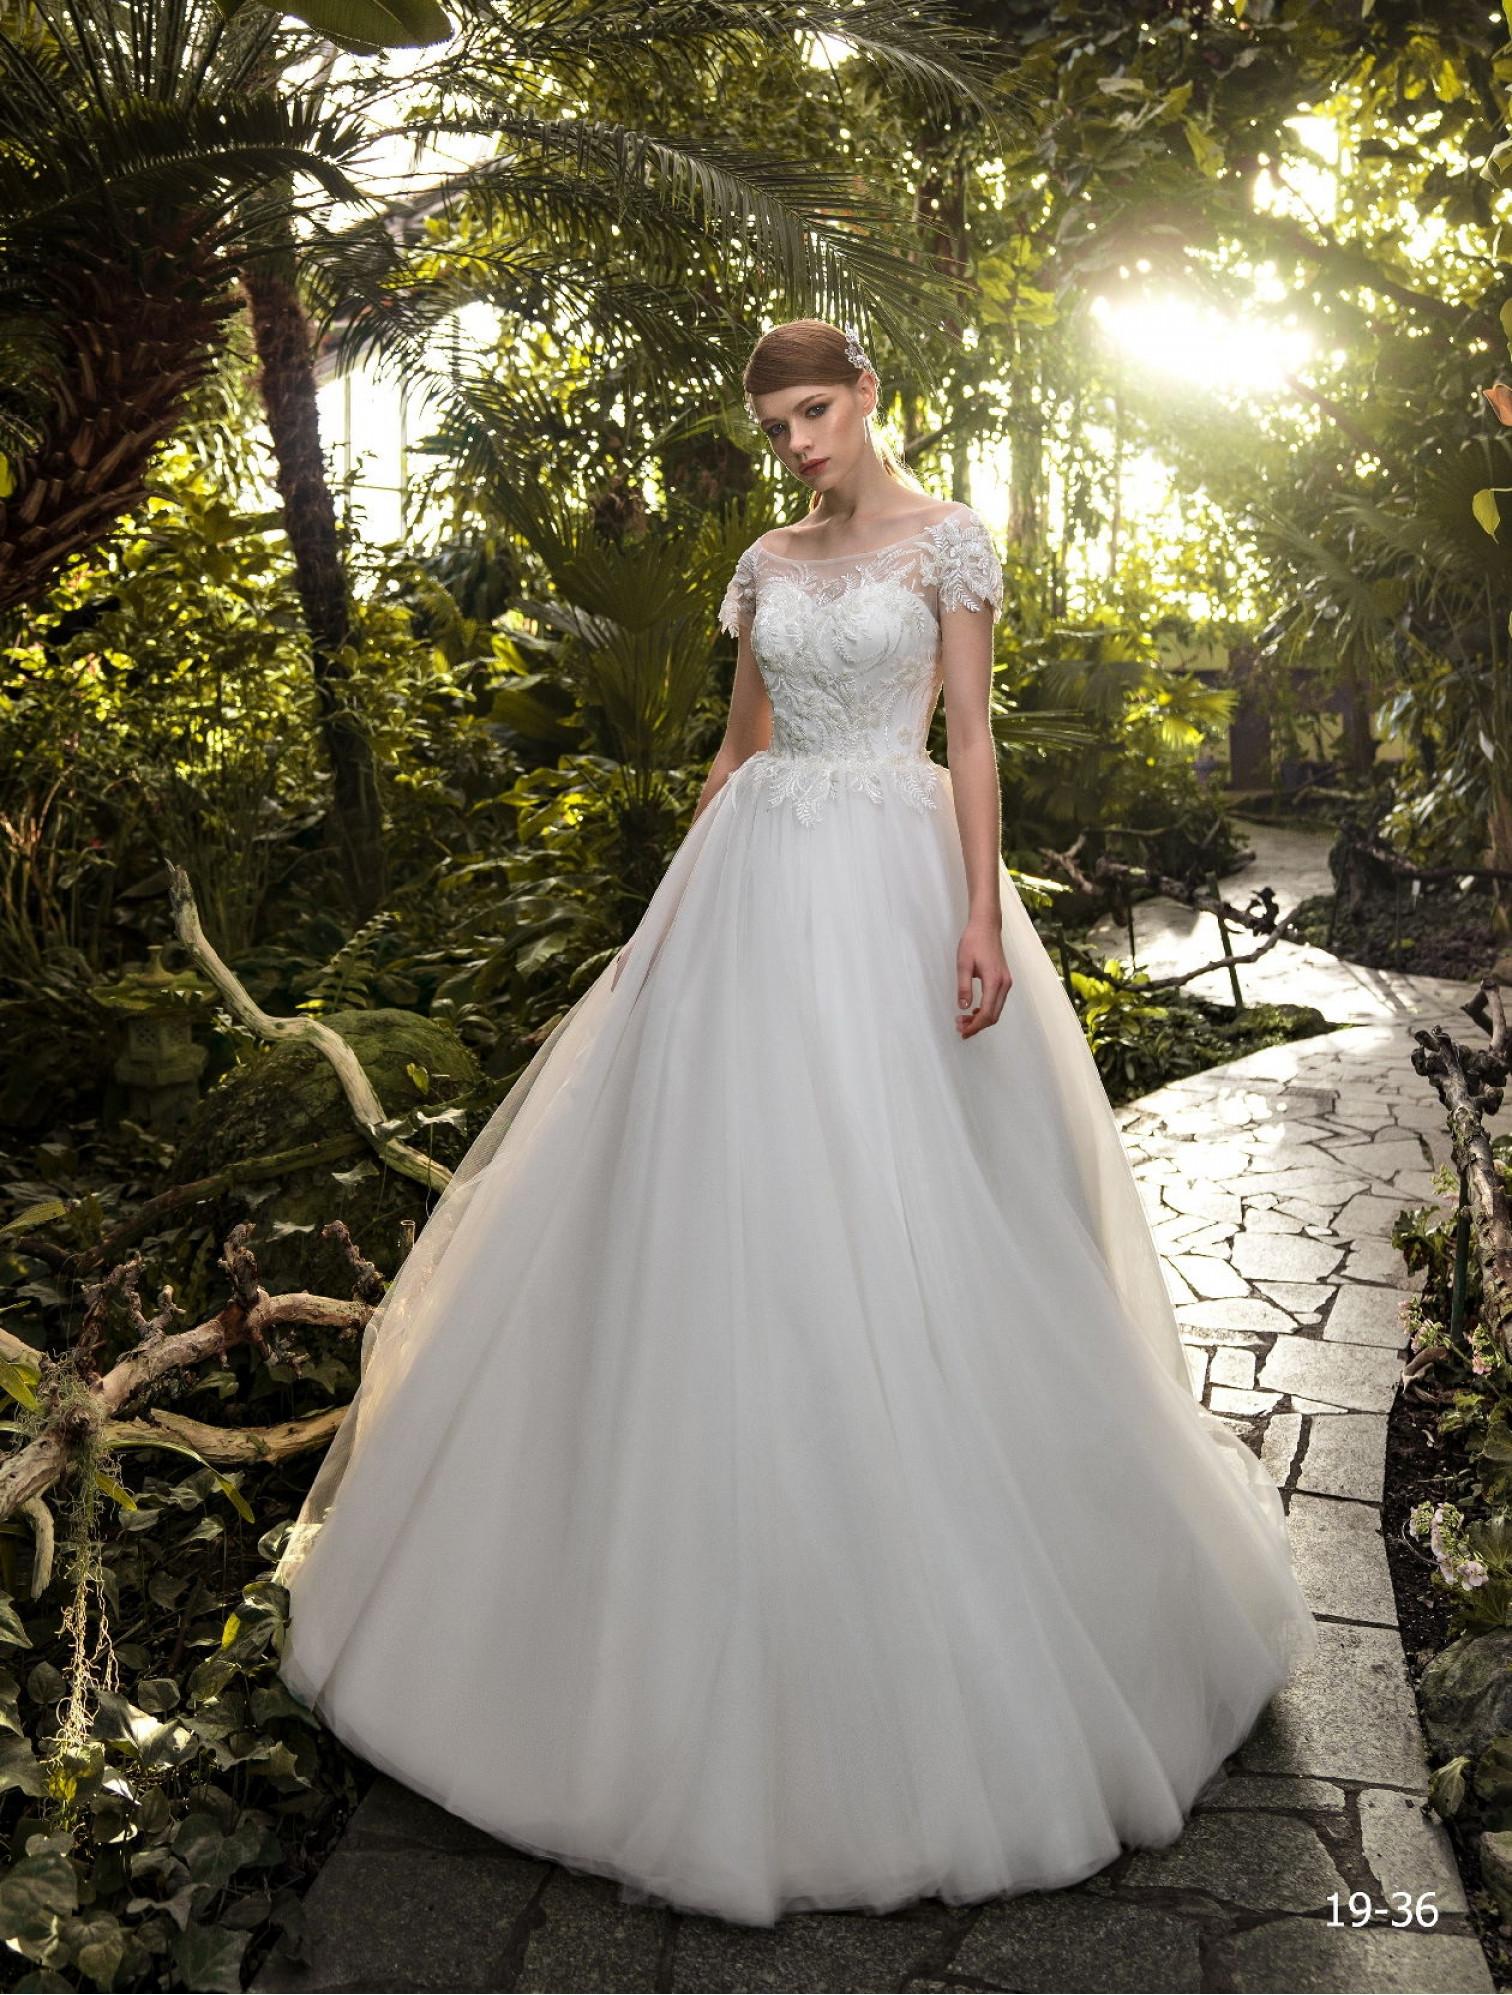 Wedding dress 19-36